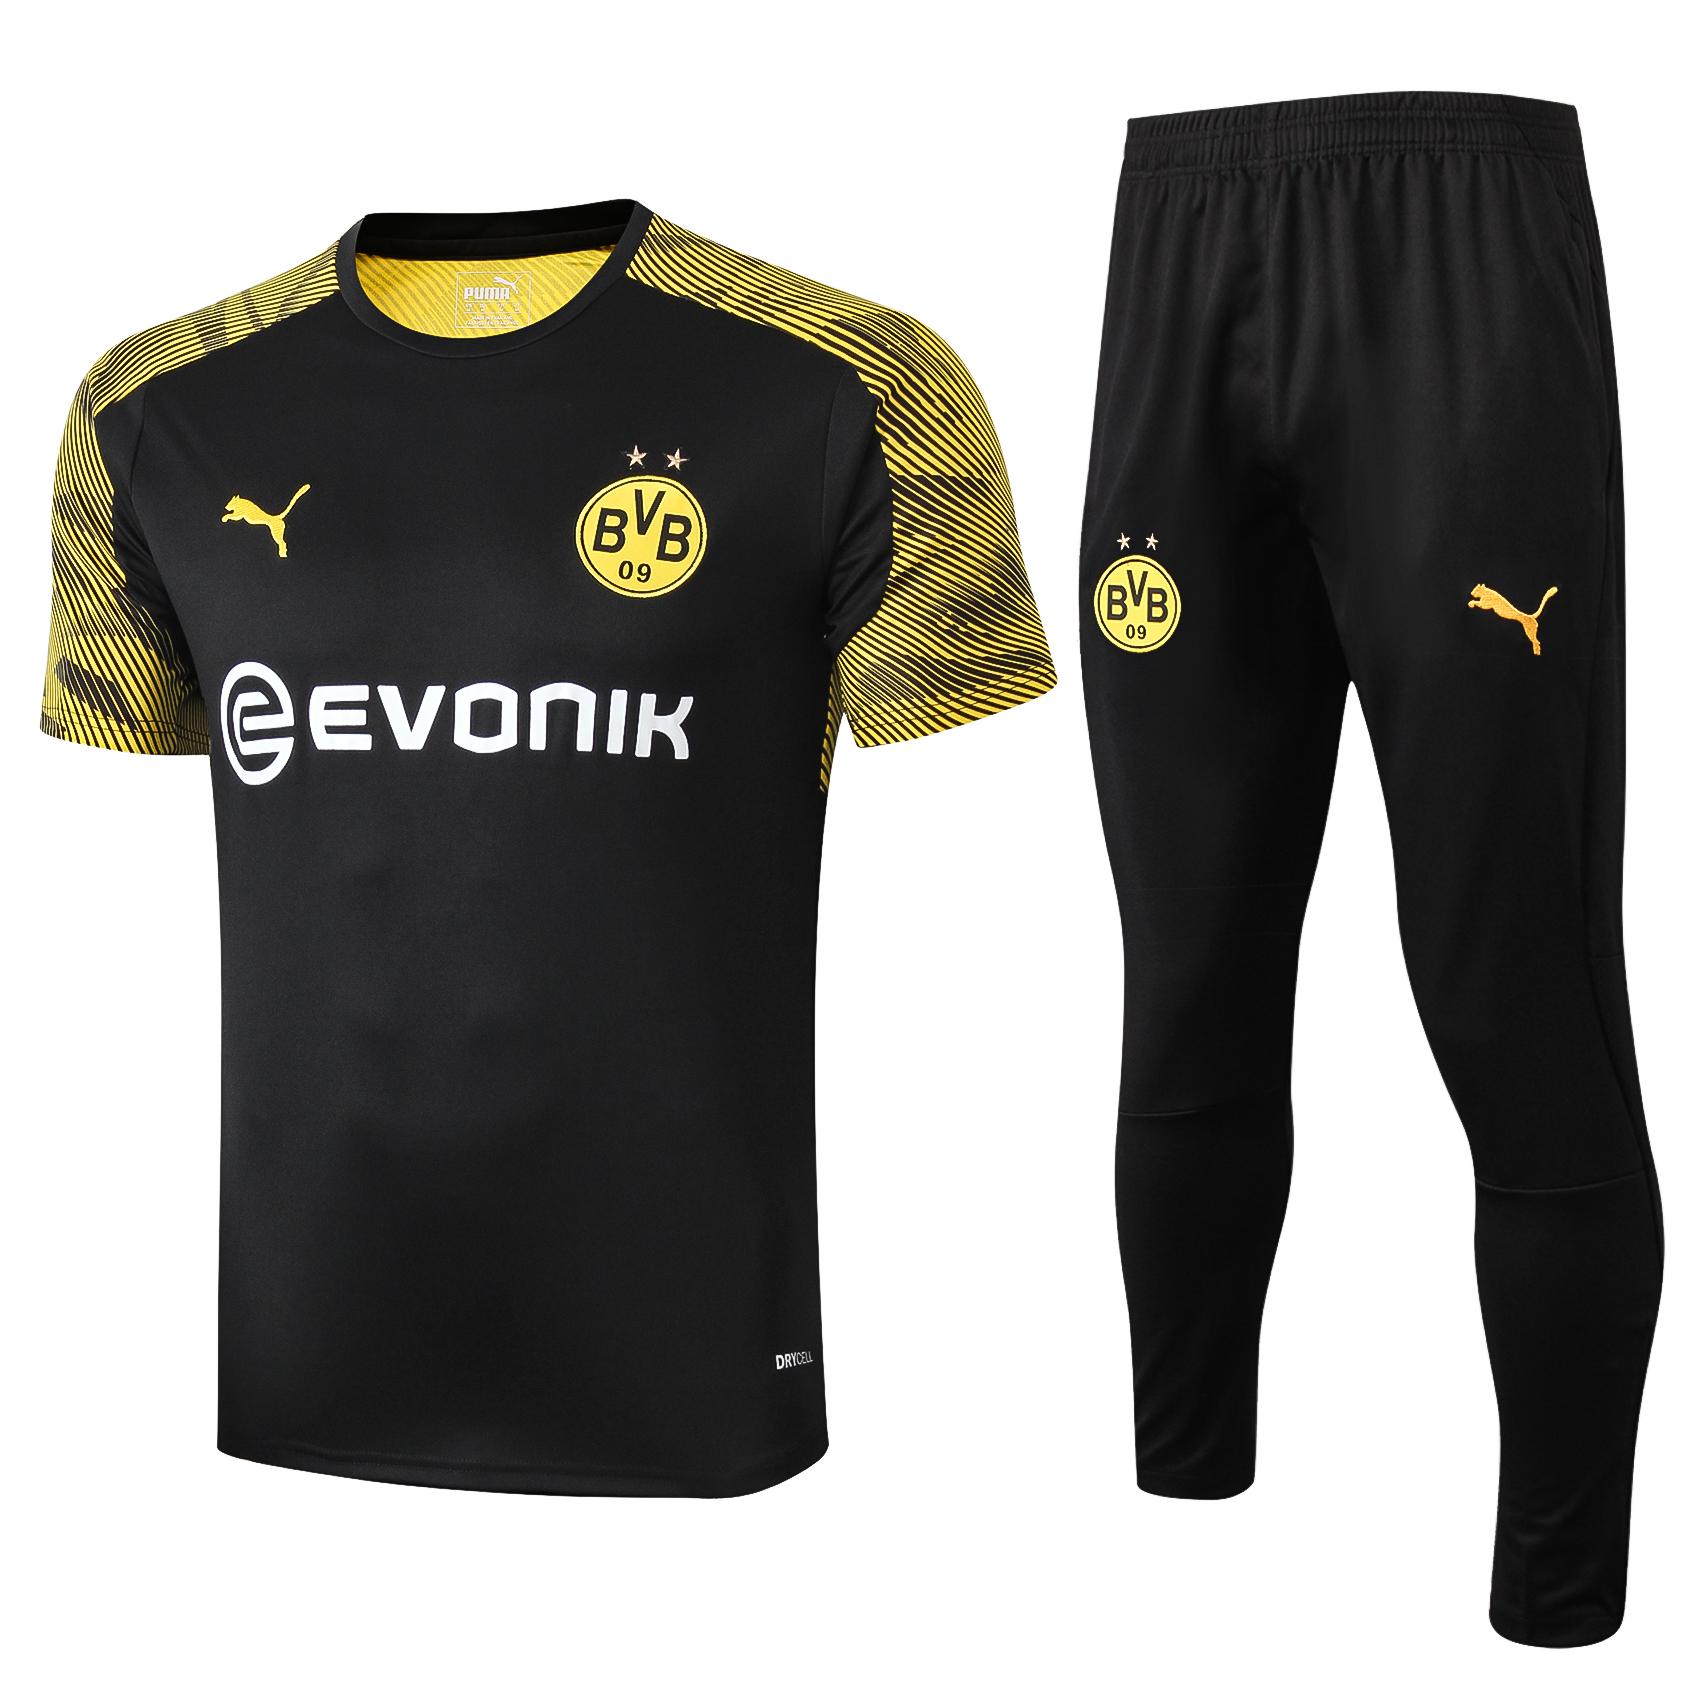 Bvb Borussia Dortmund Adult Black Pre Match Shirt 2019 20